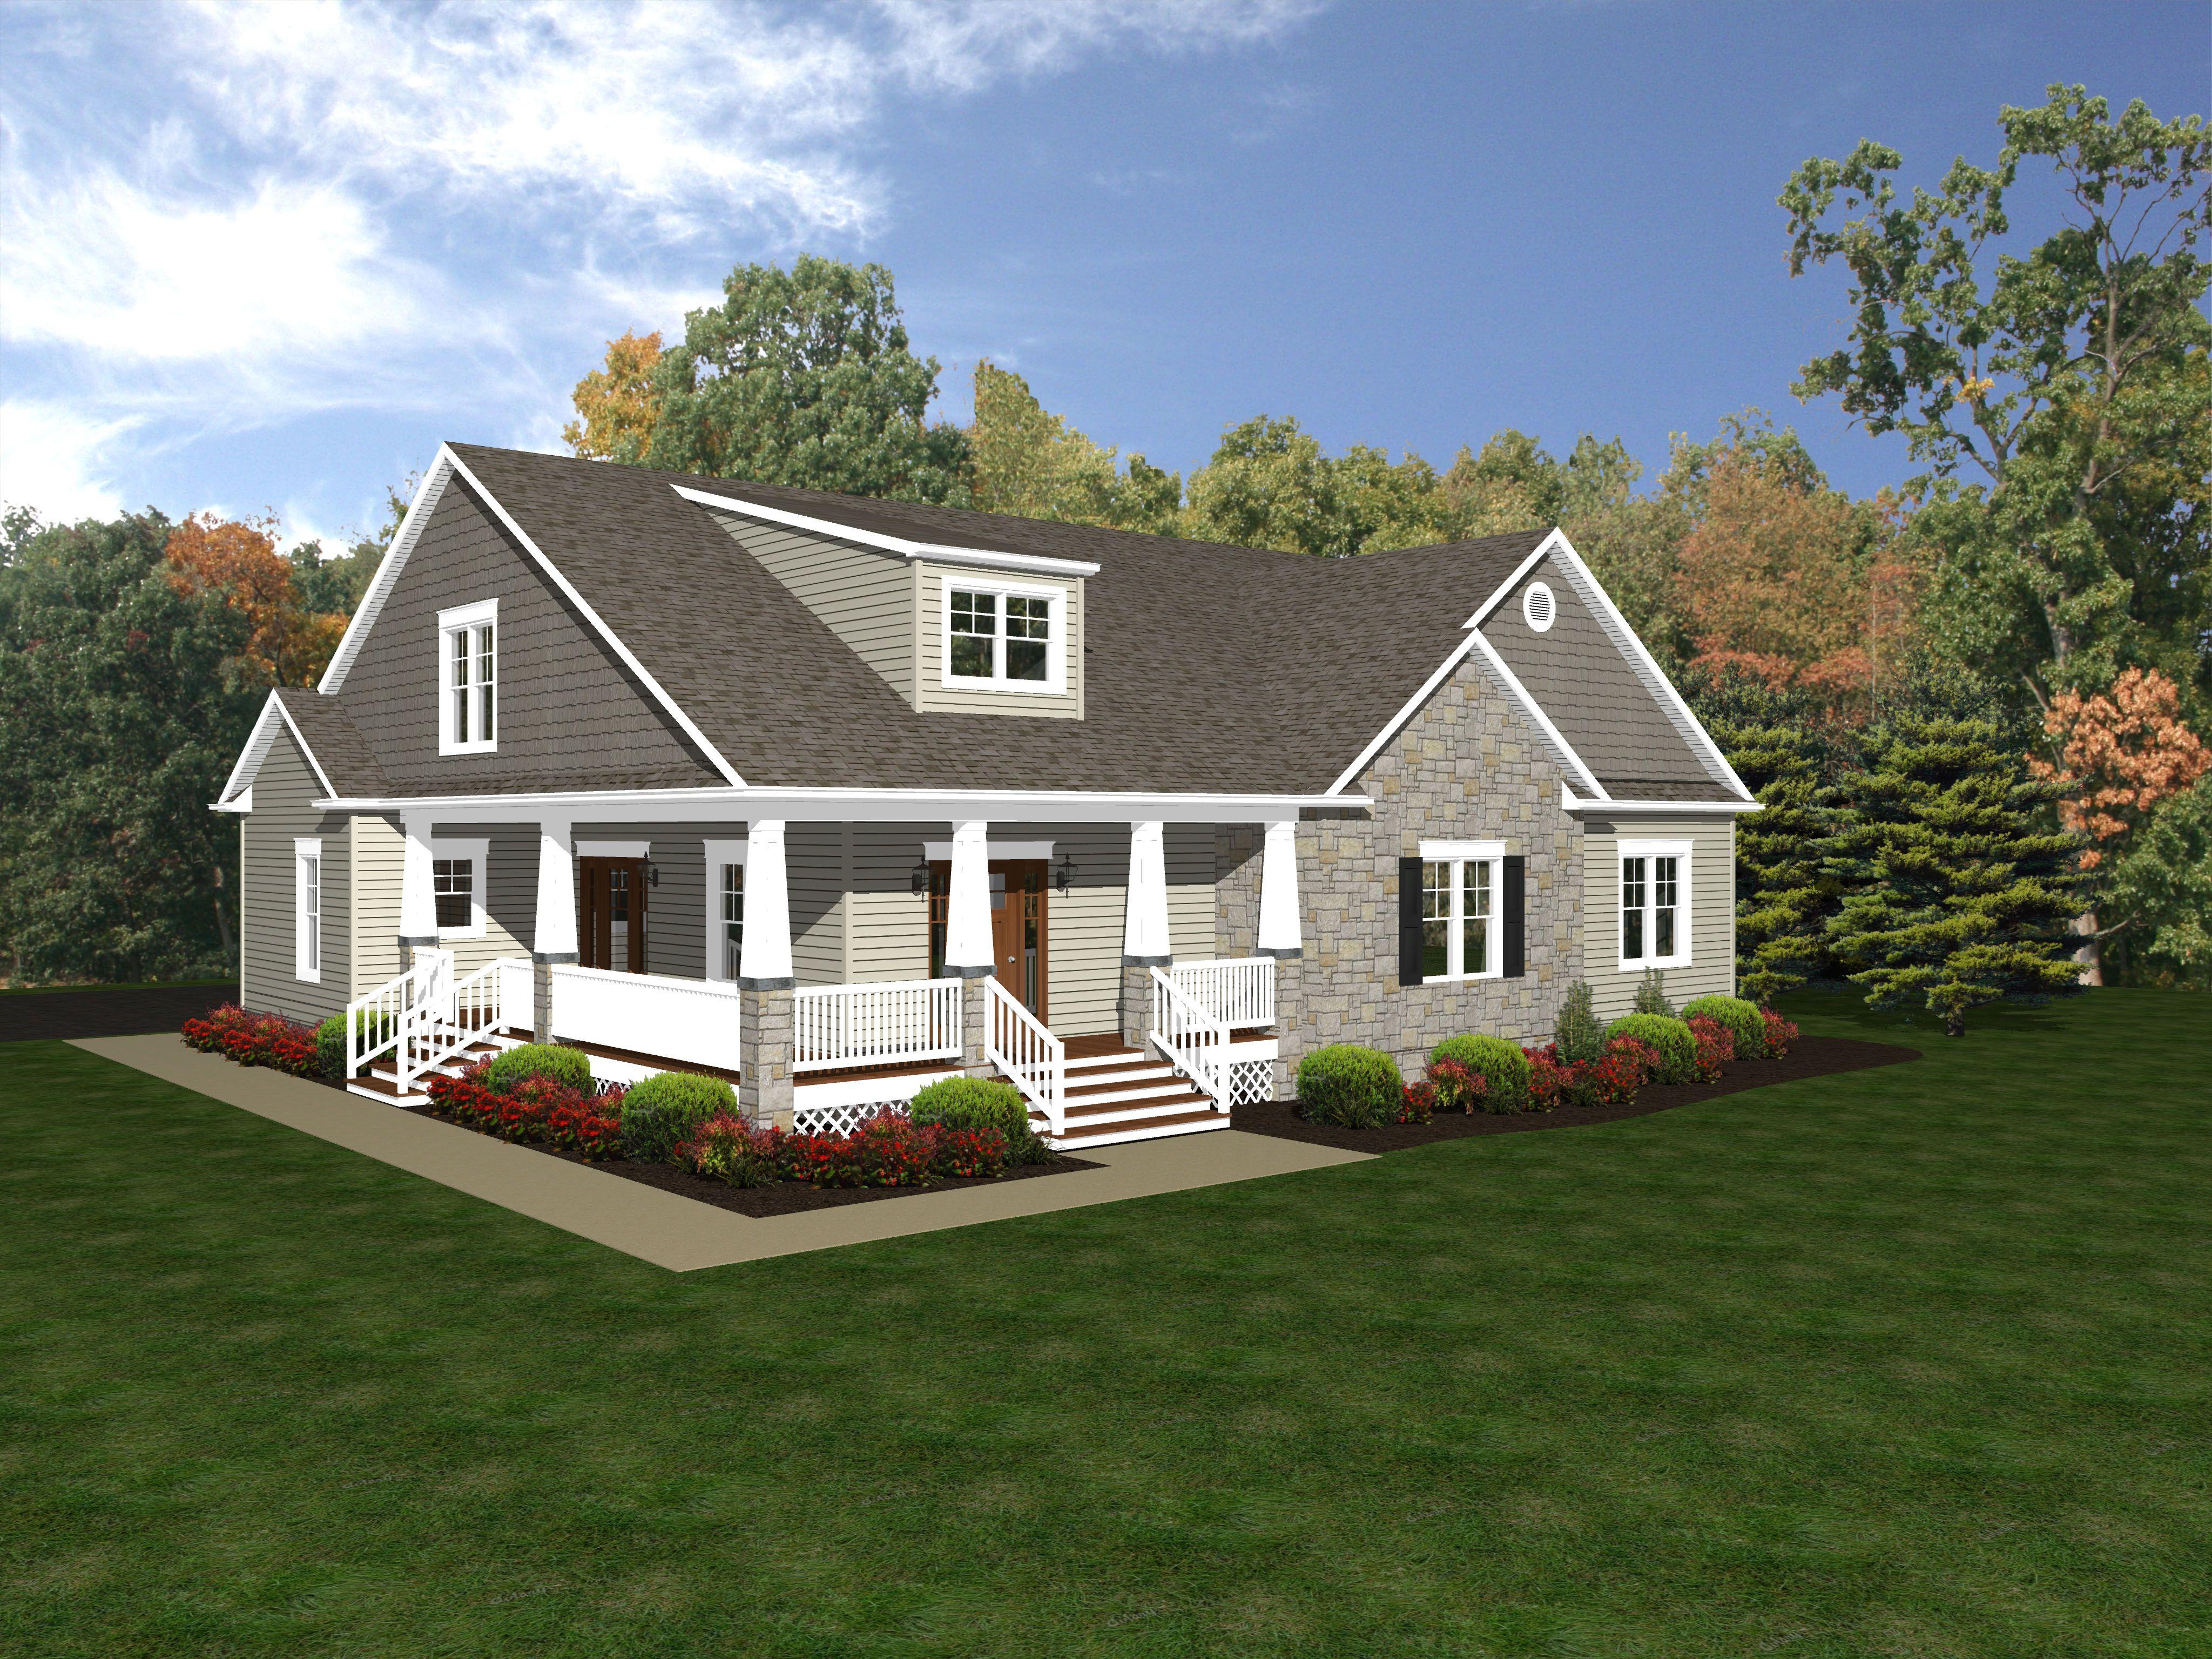 Greenwood Craftsman Craftsman House Plans Exterior House Remodel Modular Home Plans